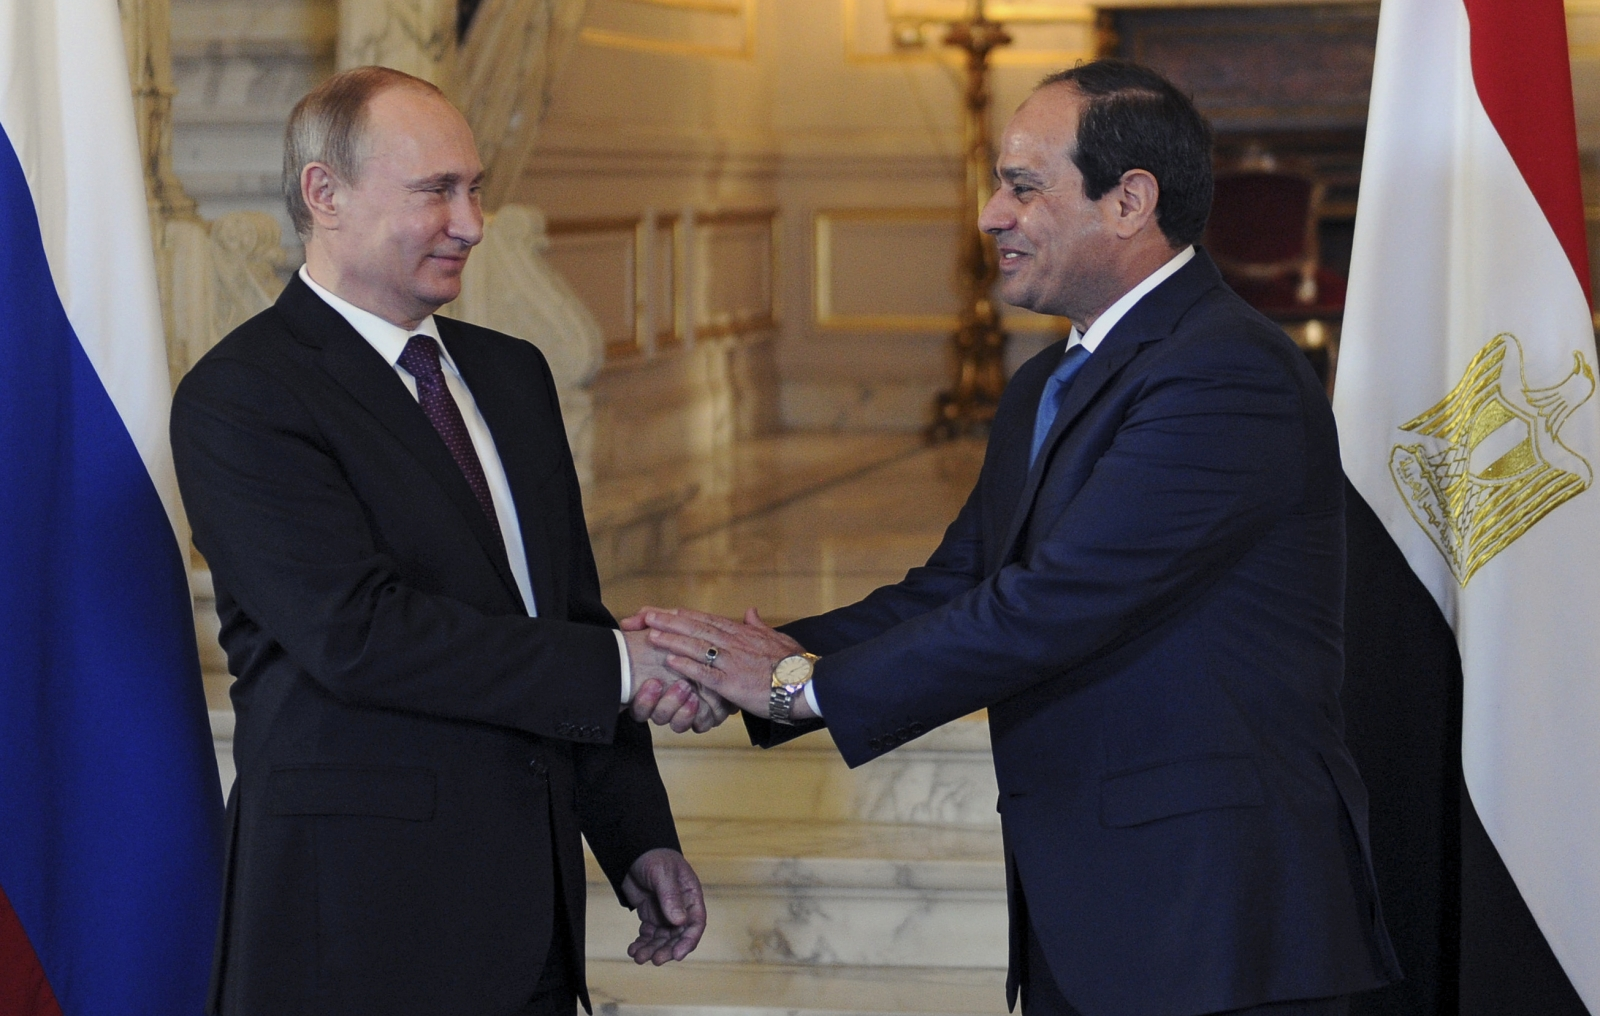 Vladimir Putin Abdel Fattah al-Sisi